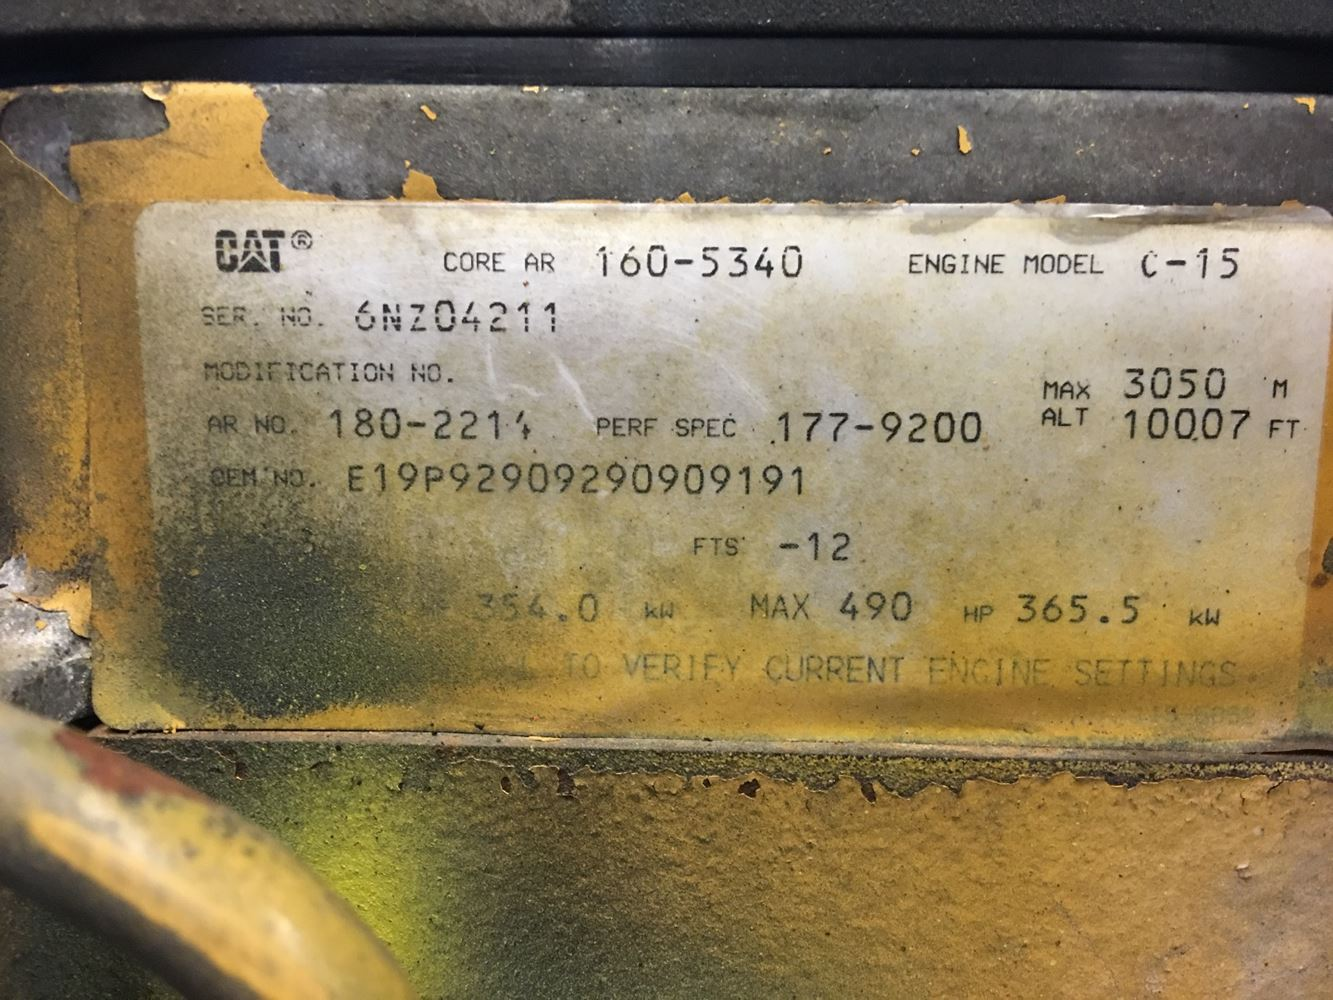 TractorData.com - Tractor Serial Numbers